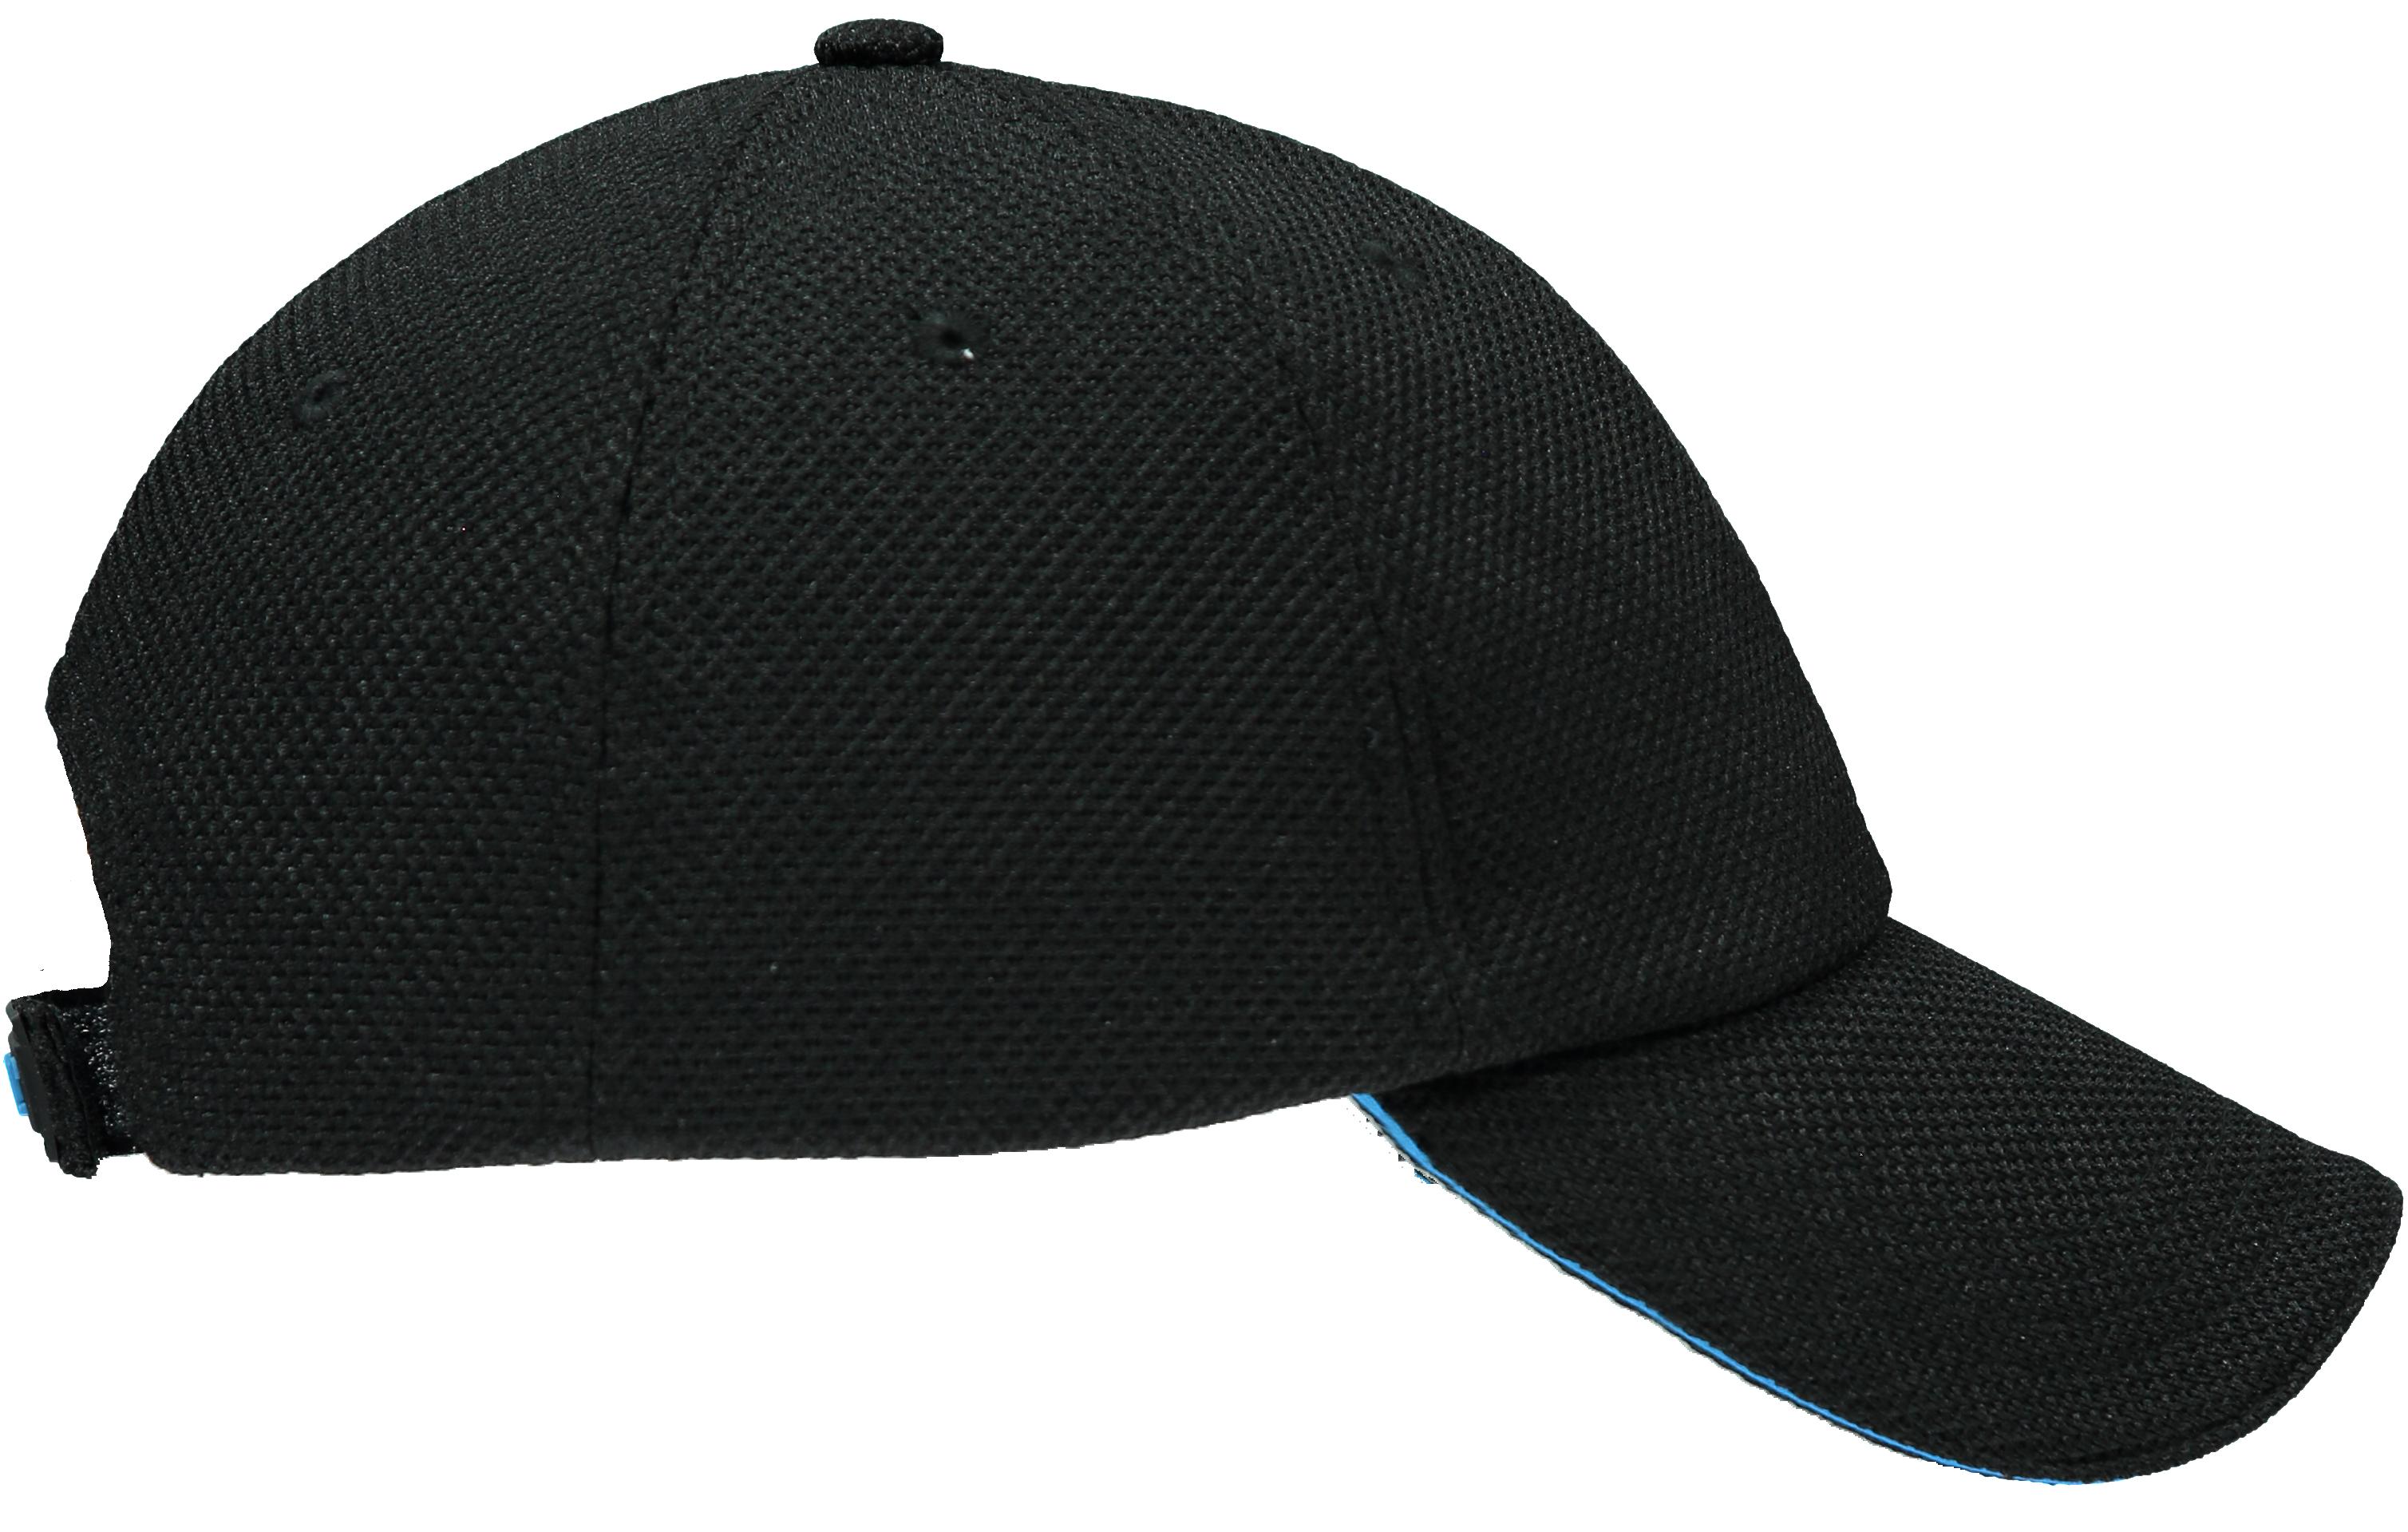 Aerochill Evaporative Cooling Cap Colour Black Uv 40 Prot